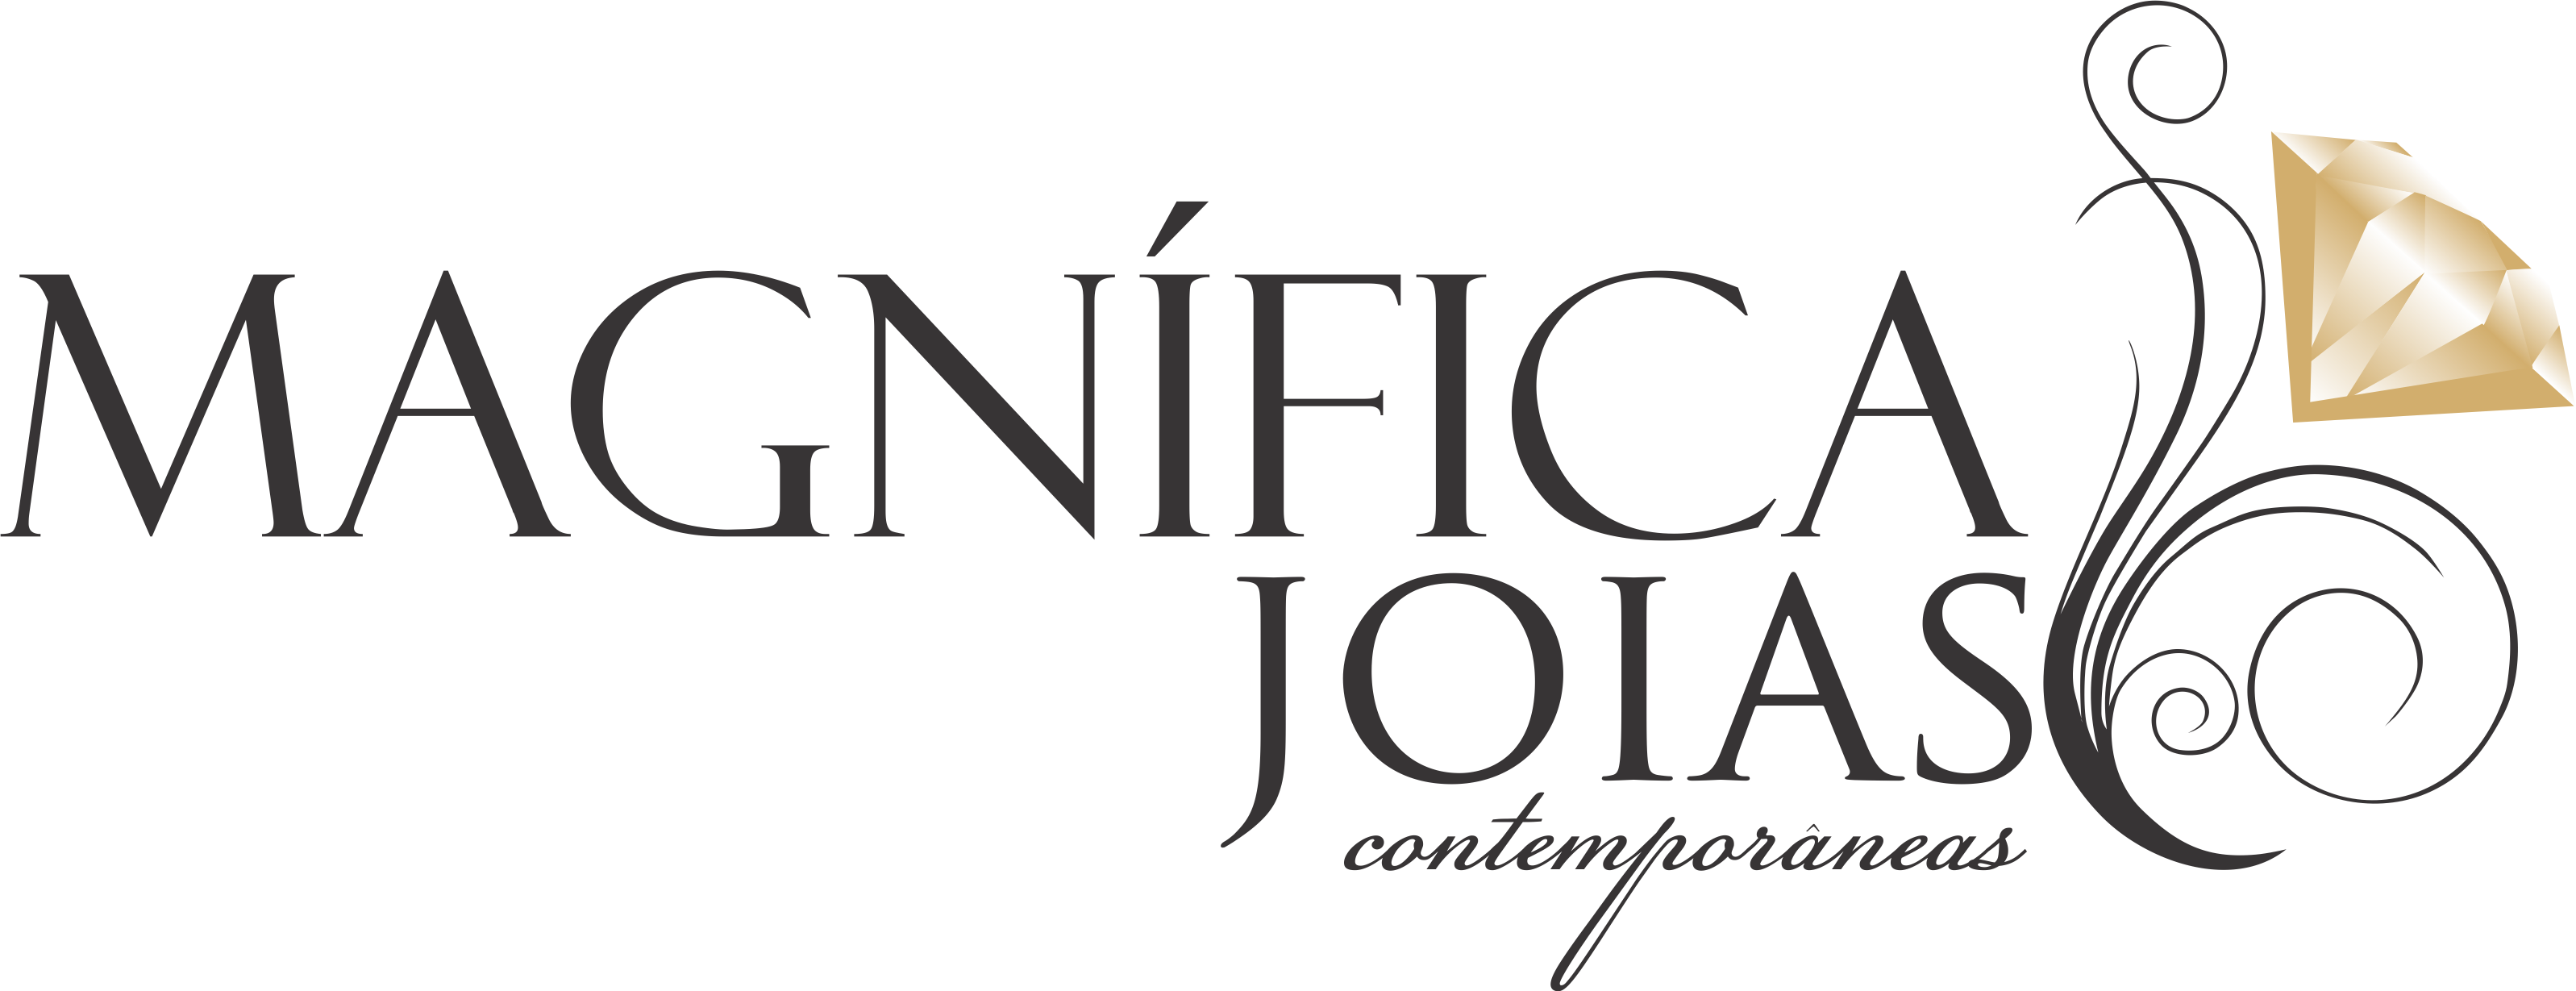 Magnífica Joias: Moda, joias e acessórios contemporâneos